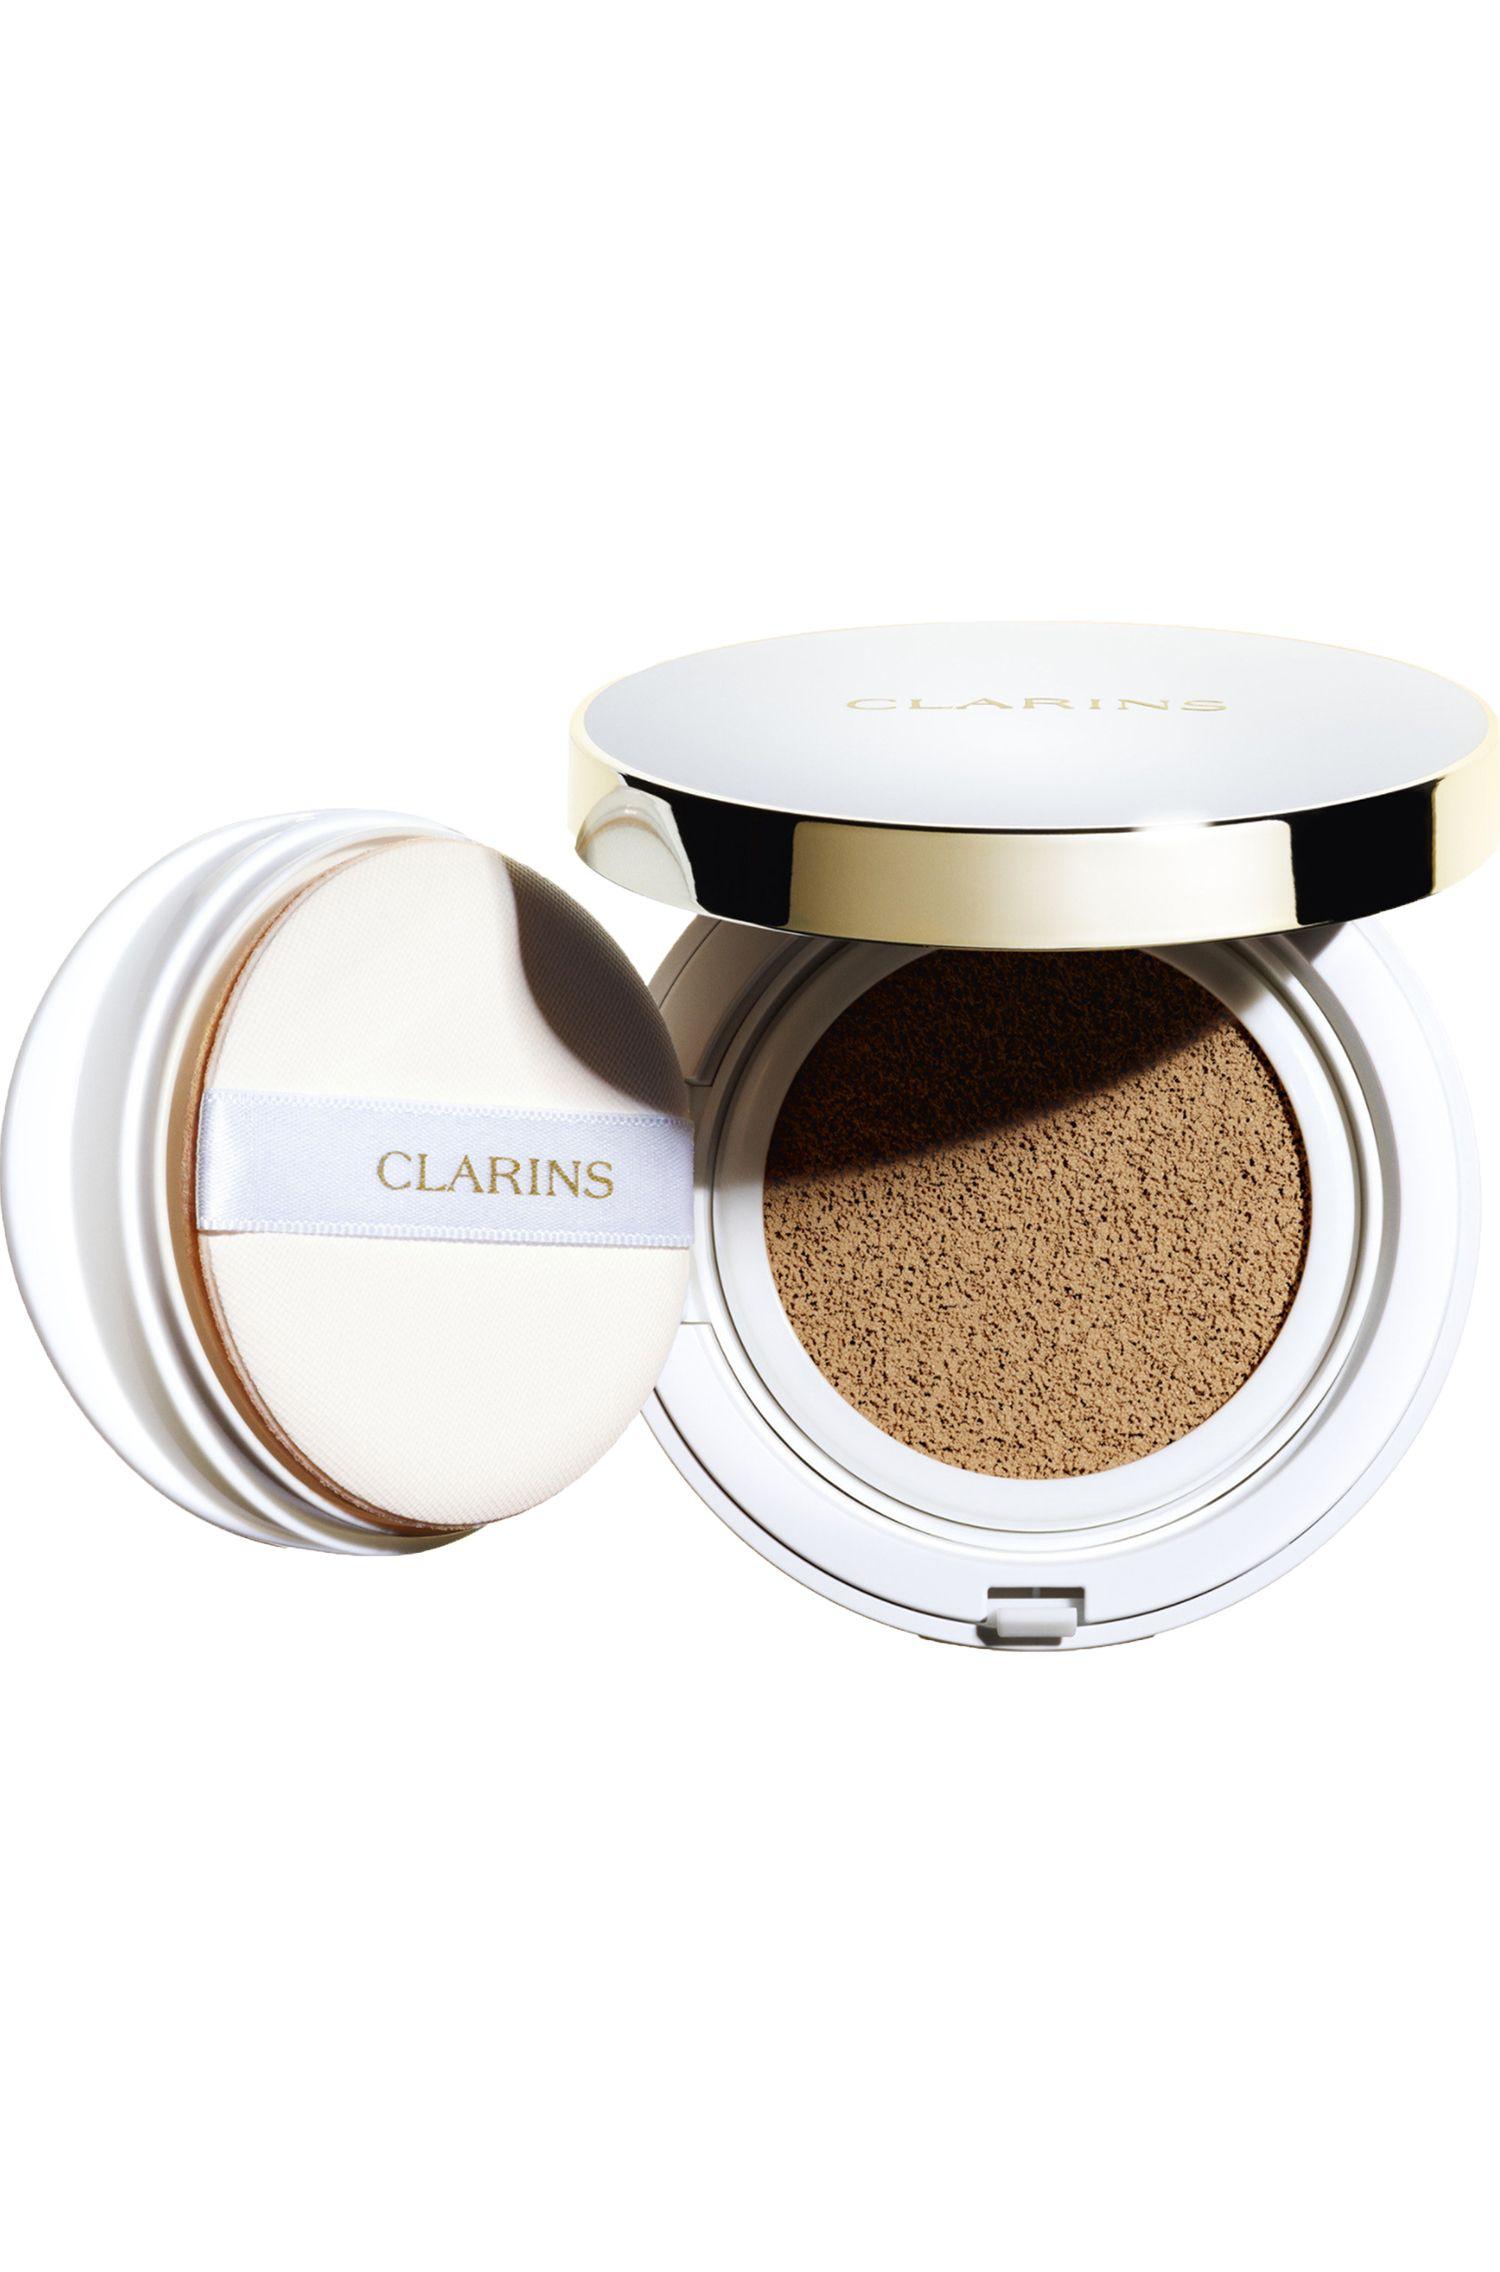 Blissim : Clarins - Fond de teint Cushion longue tenue SPF50 - 108 Sand